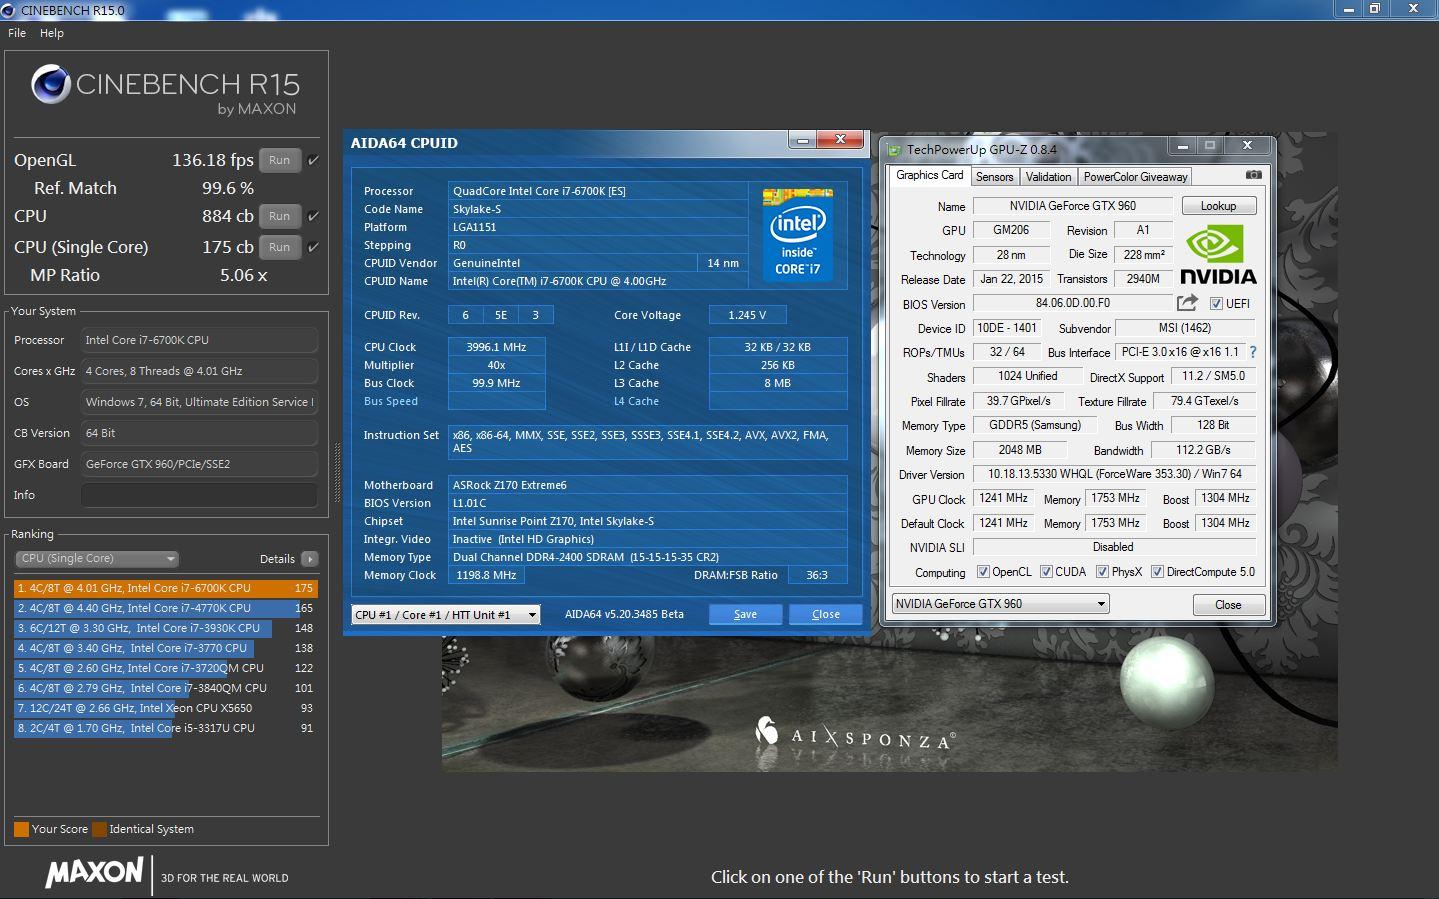 intel-core-i7-6700k_stock_cinebench-r15